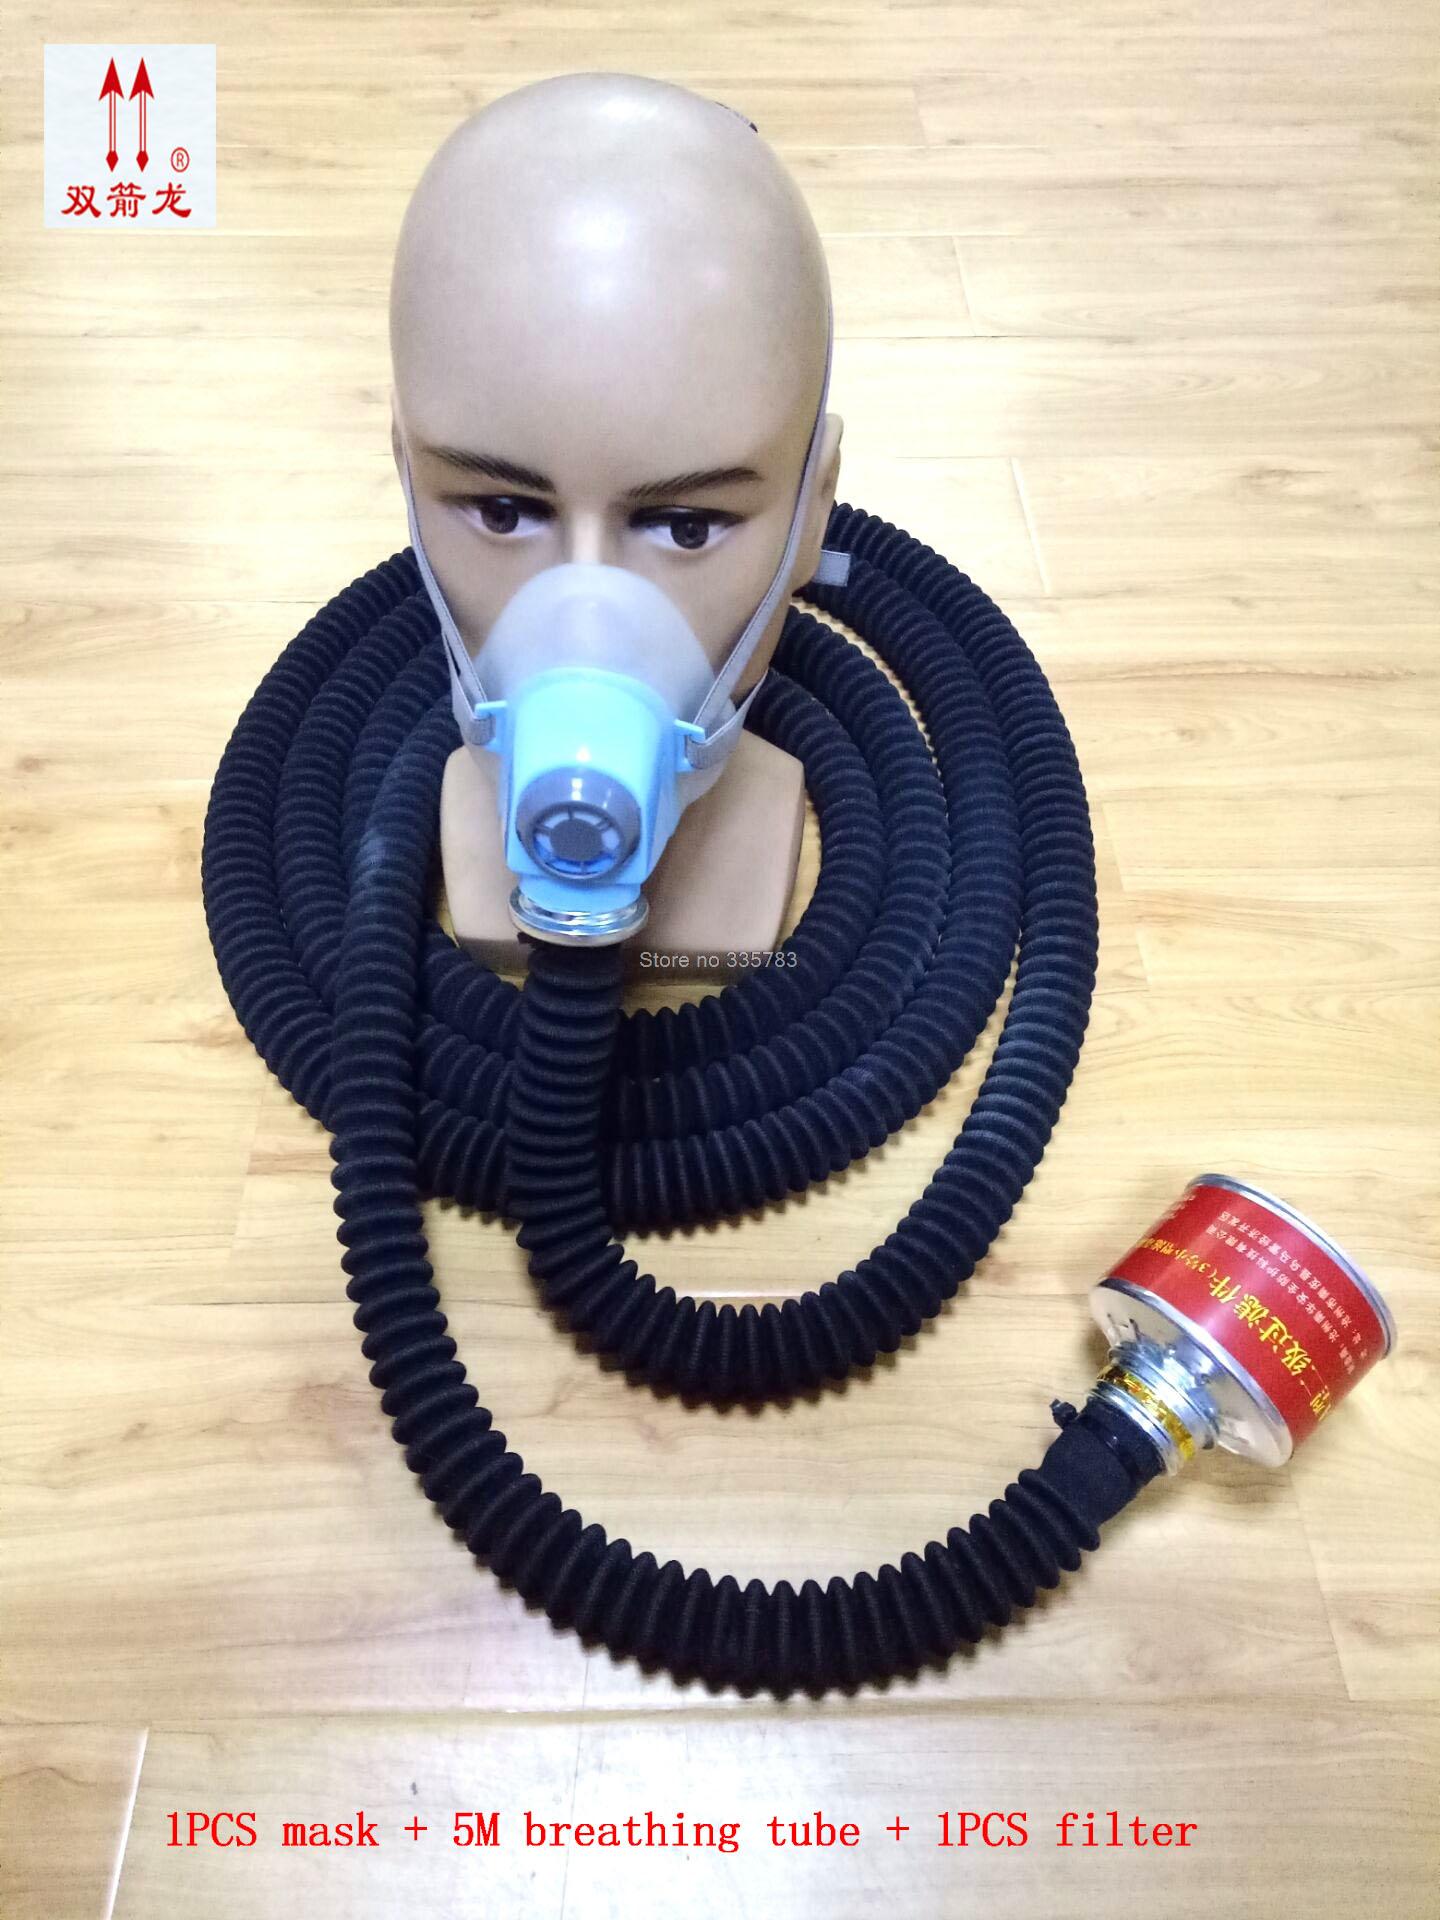 5M Breathing tube respirator gas mask high quality new gas mask tunnel basement Dangerous operation gas mask 6fc5247 caa11 1aa3 keysters mask operation panel